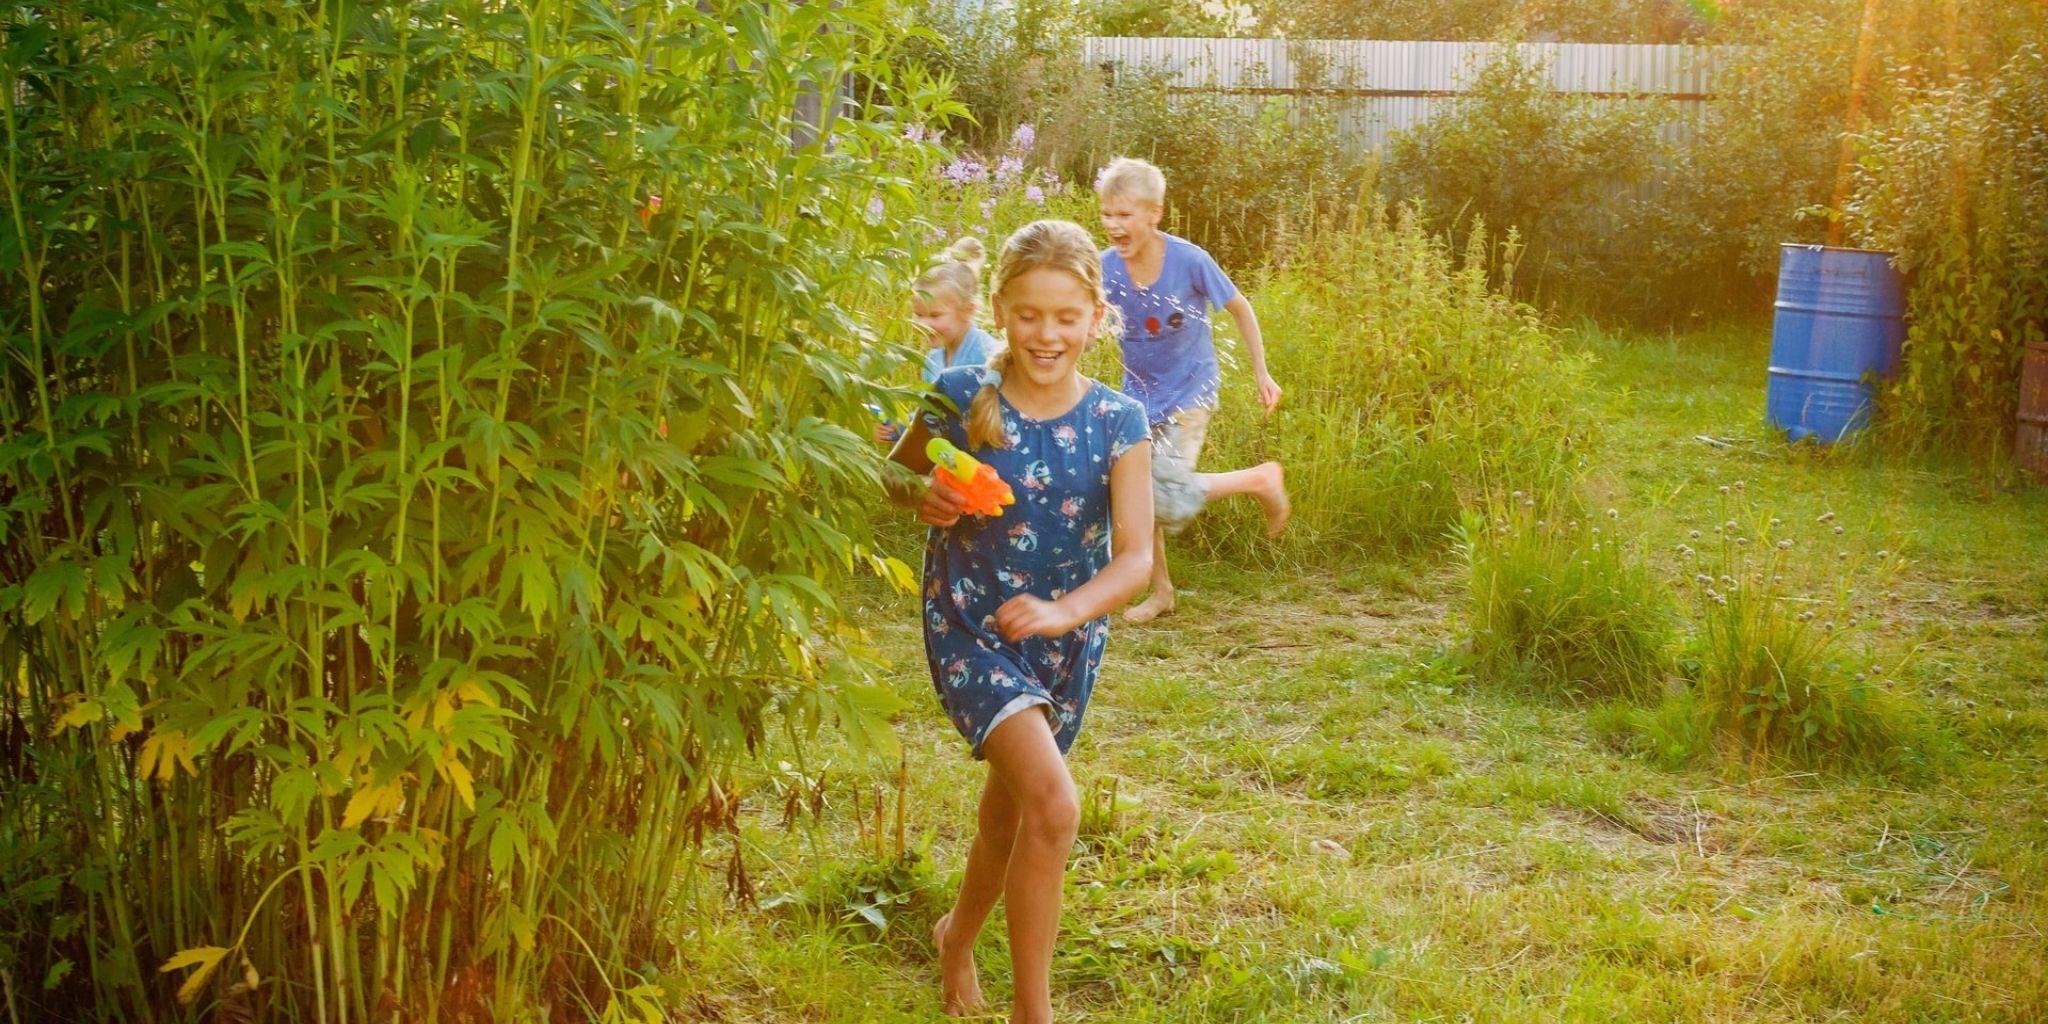 Backyard activities for kids: summer activities on a budget